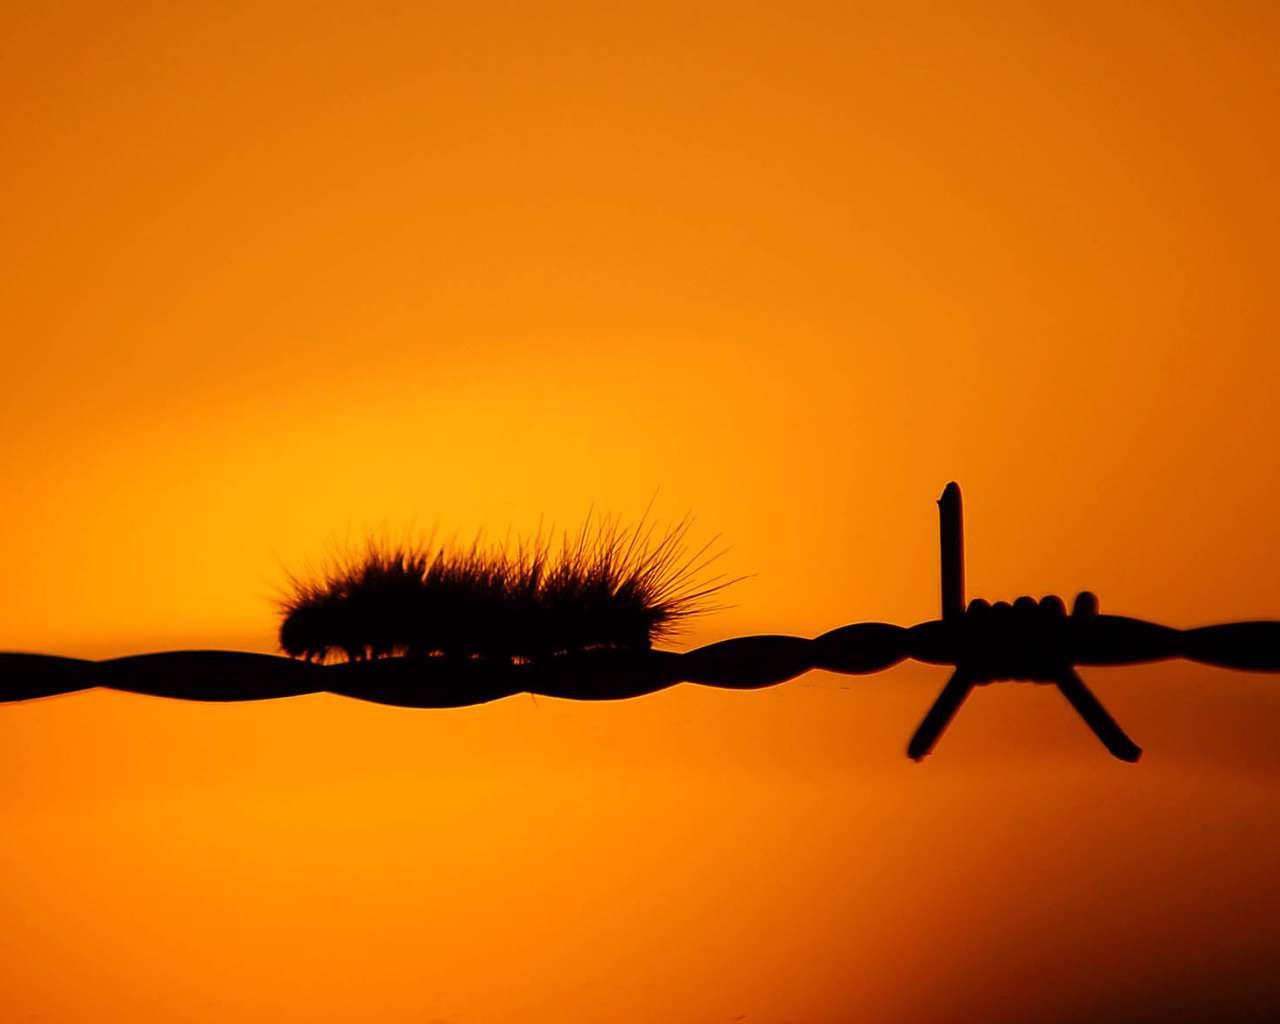 تصاویر وکتور سیم خاردار و آزادی، سری اول